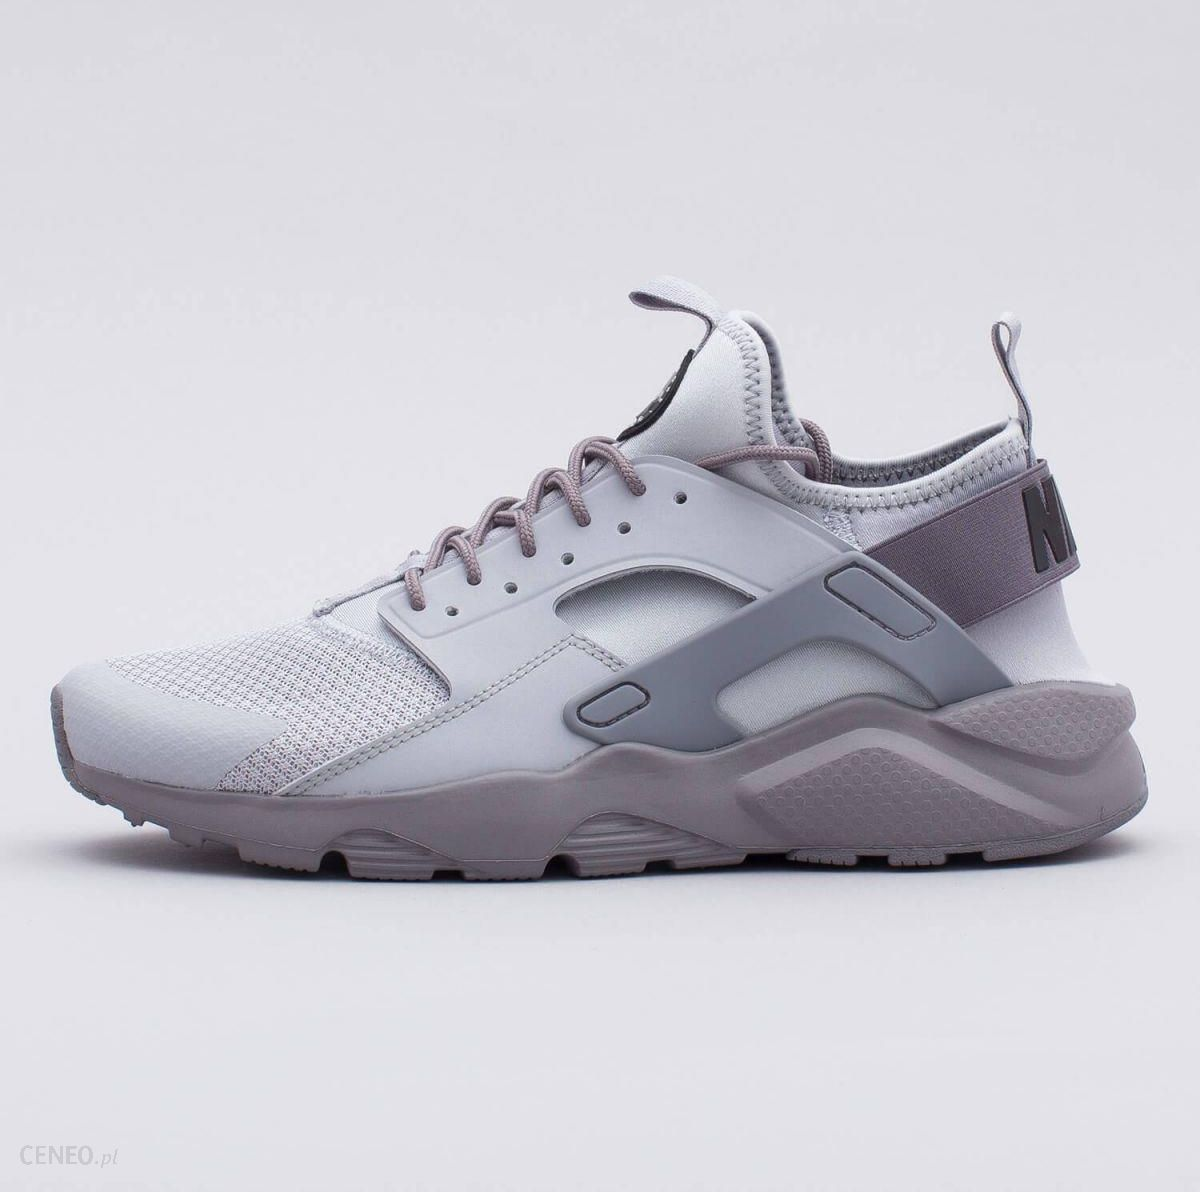 the latest 14345 bcb92 Nike AIR HUARACHE RUN ULTRA 819685-021 - Ceny i opinie - Ceneo.pl